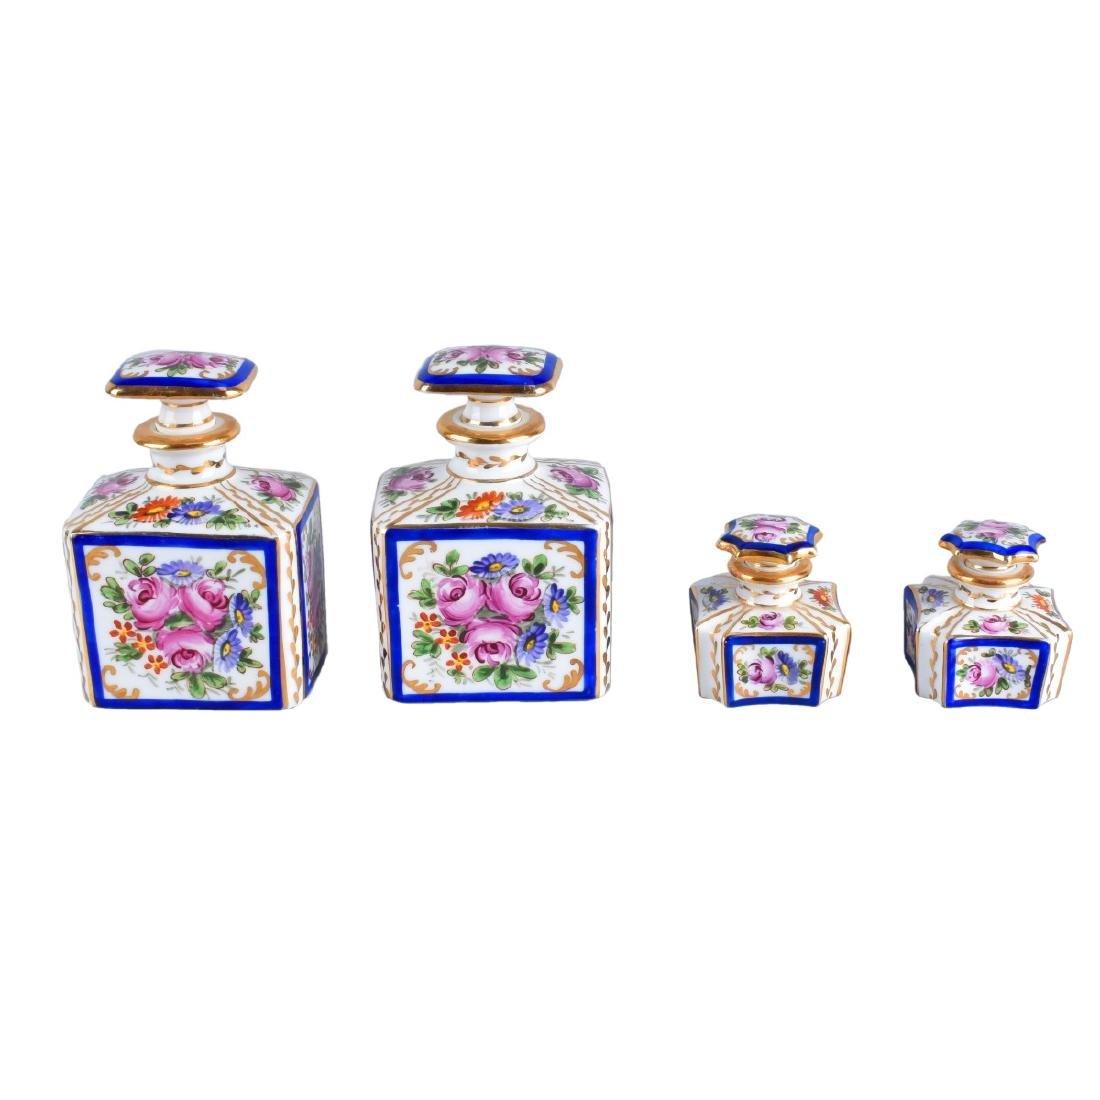 4 Sevres Perfume Bottles